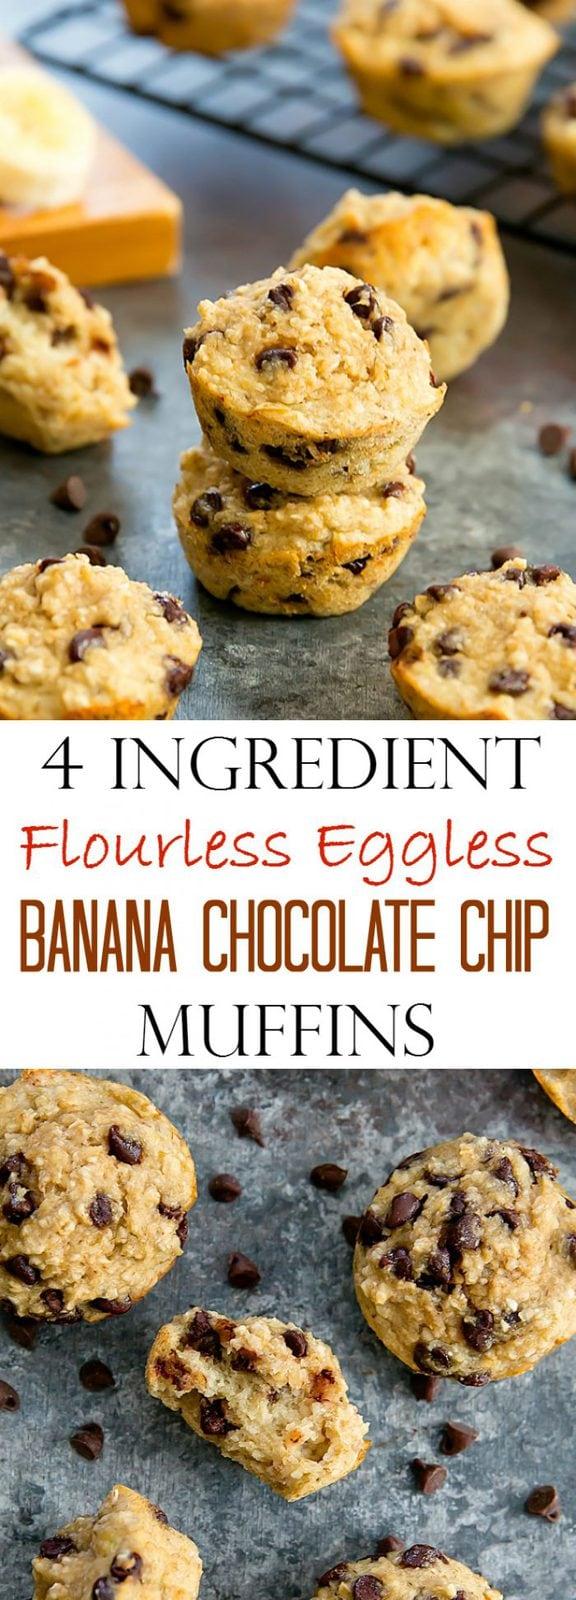 4 Ingredient Flourless Eggless Banana Chocolate Chip Muffins